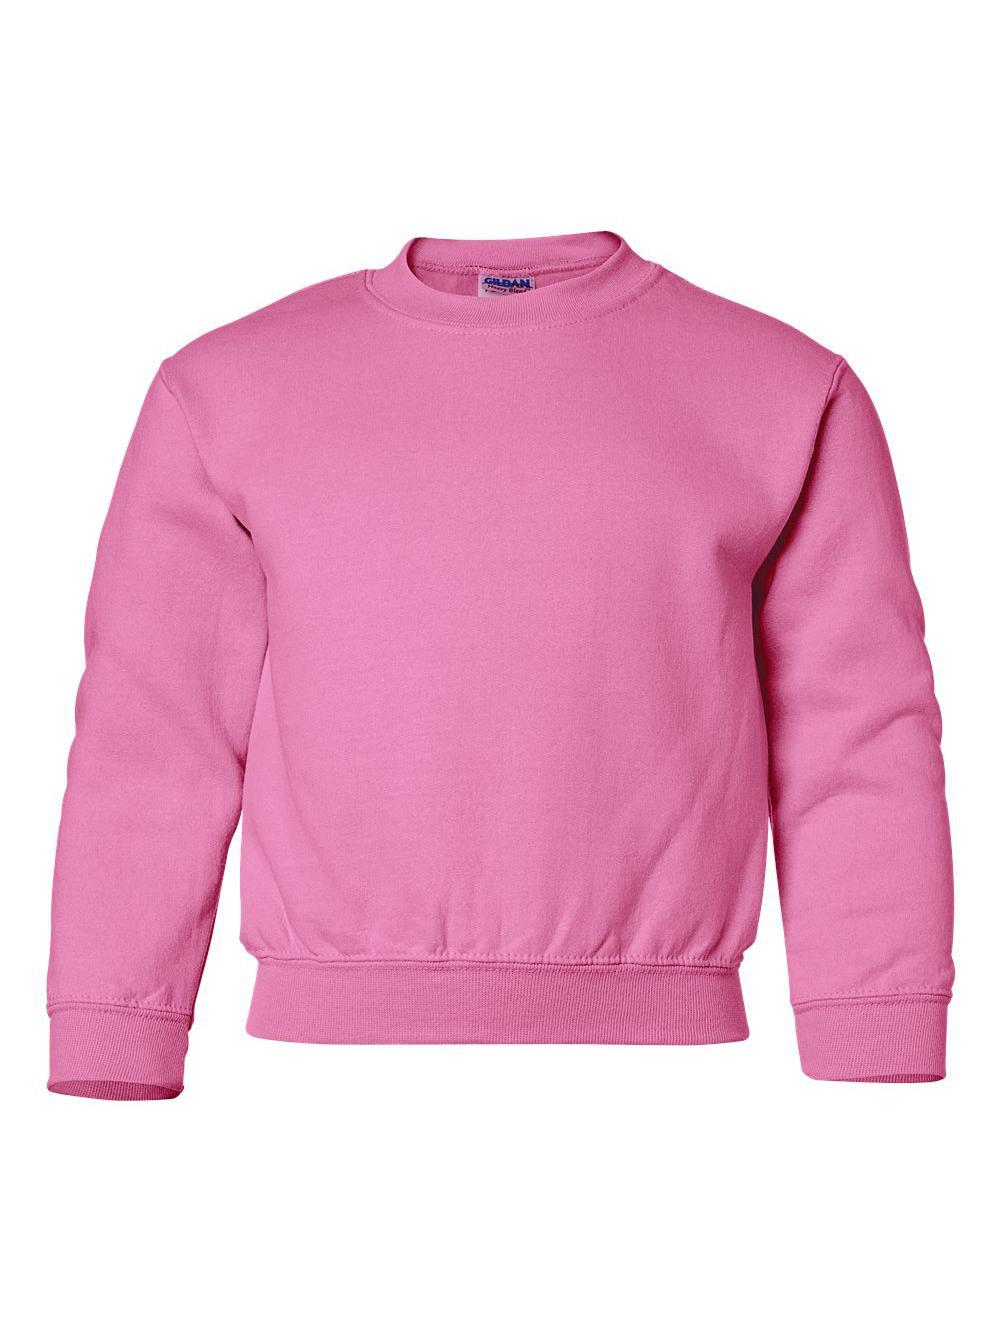 Gildan 18000B Heavy Blend Youth Crewneck Sweatshirt